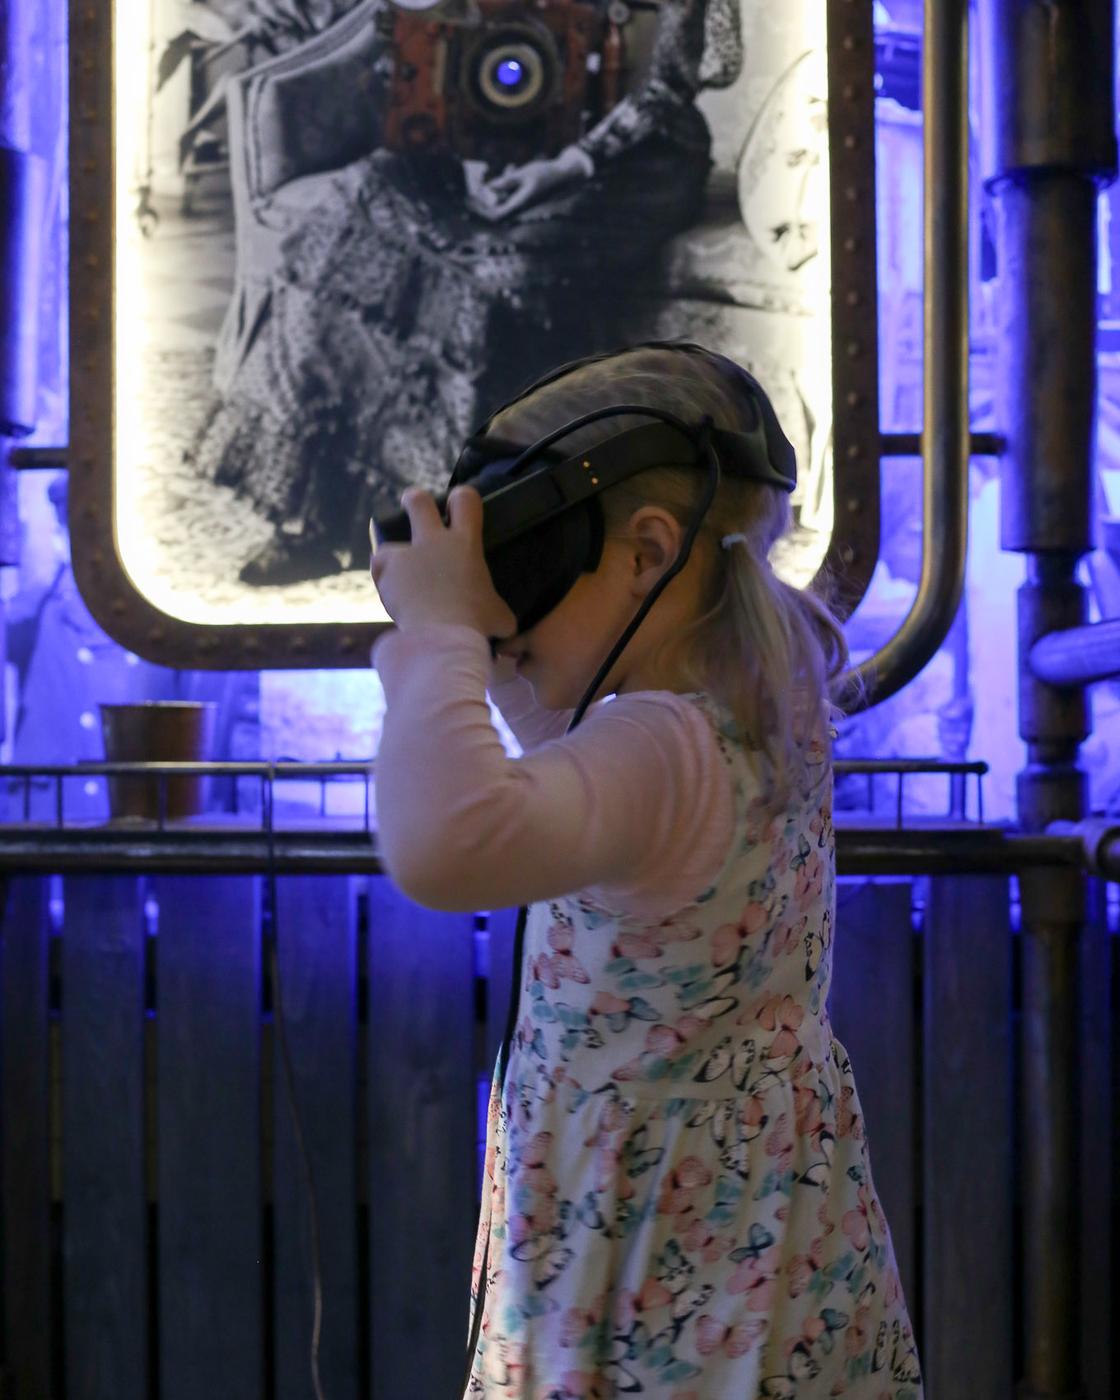 Helsingin kaupunginmuseo - Lasten kaupunki - 15.jpg